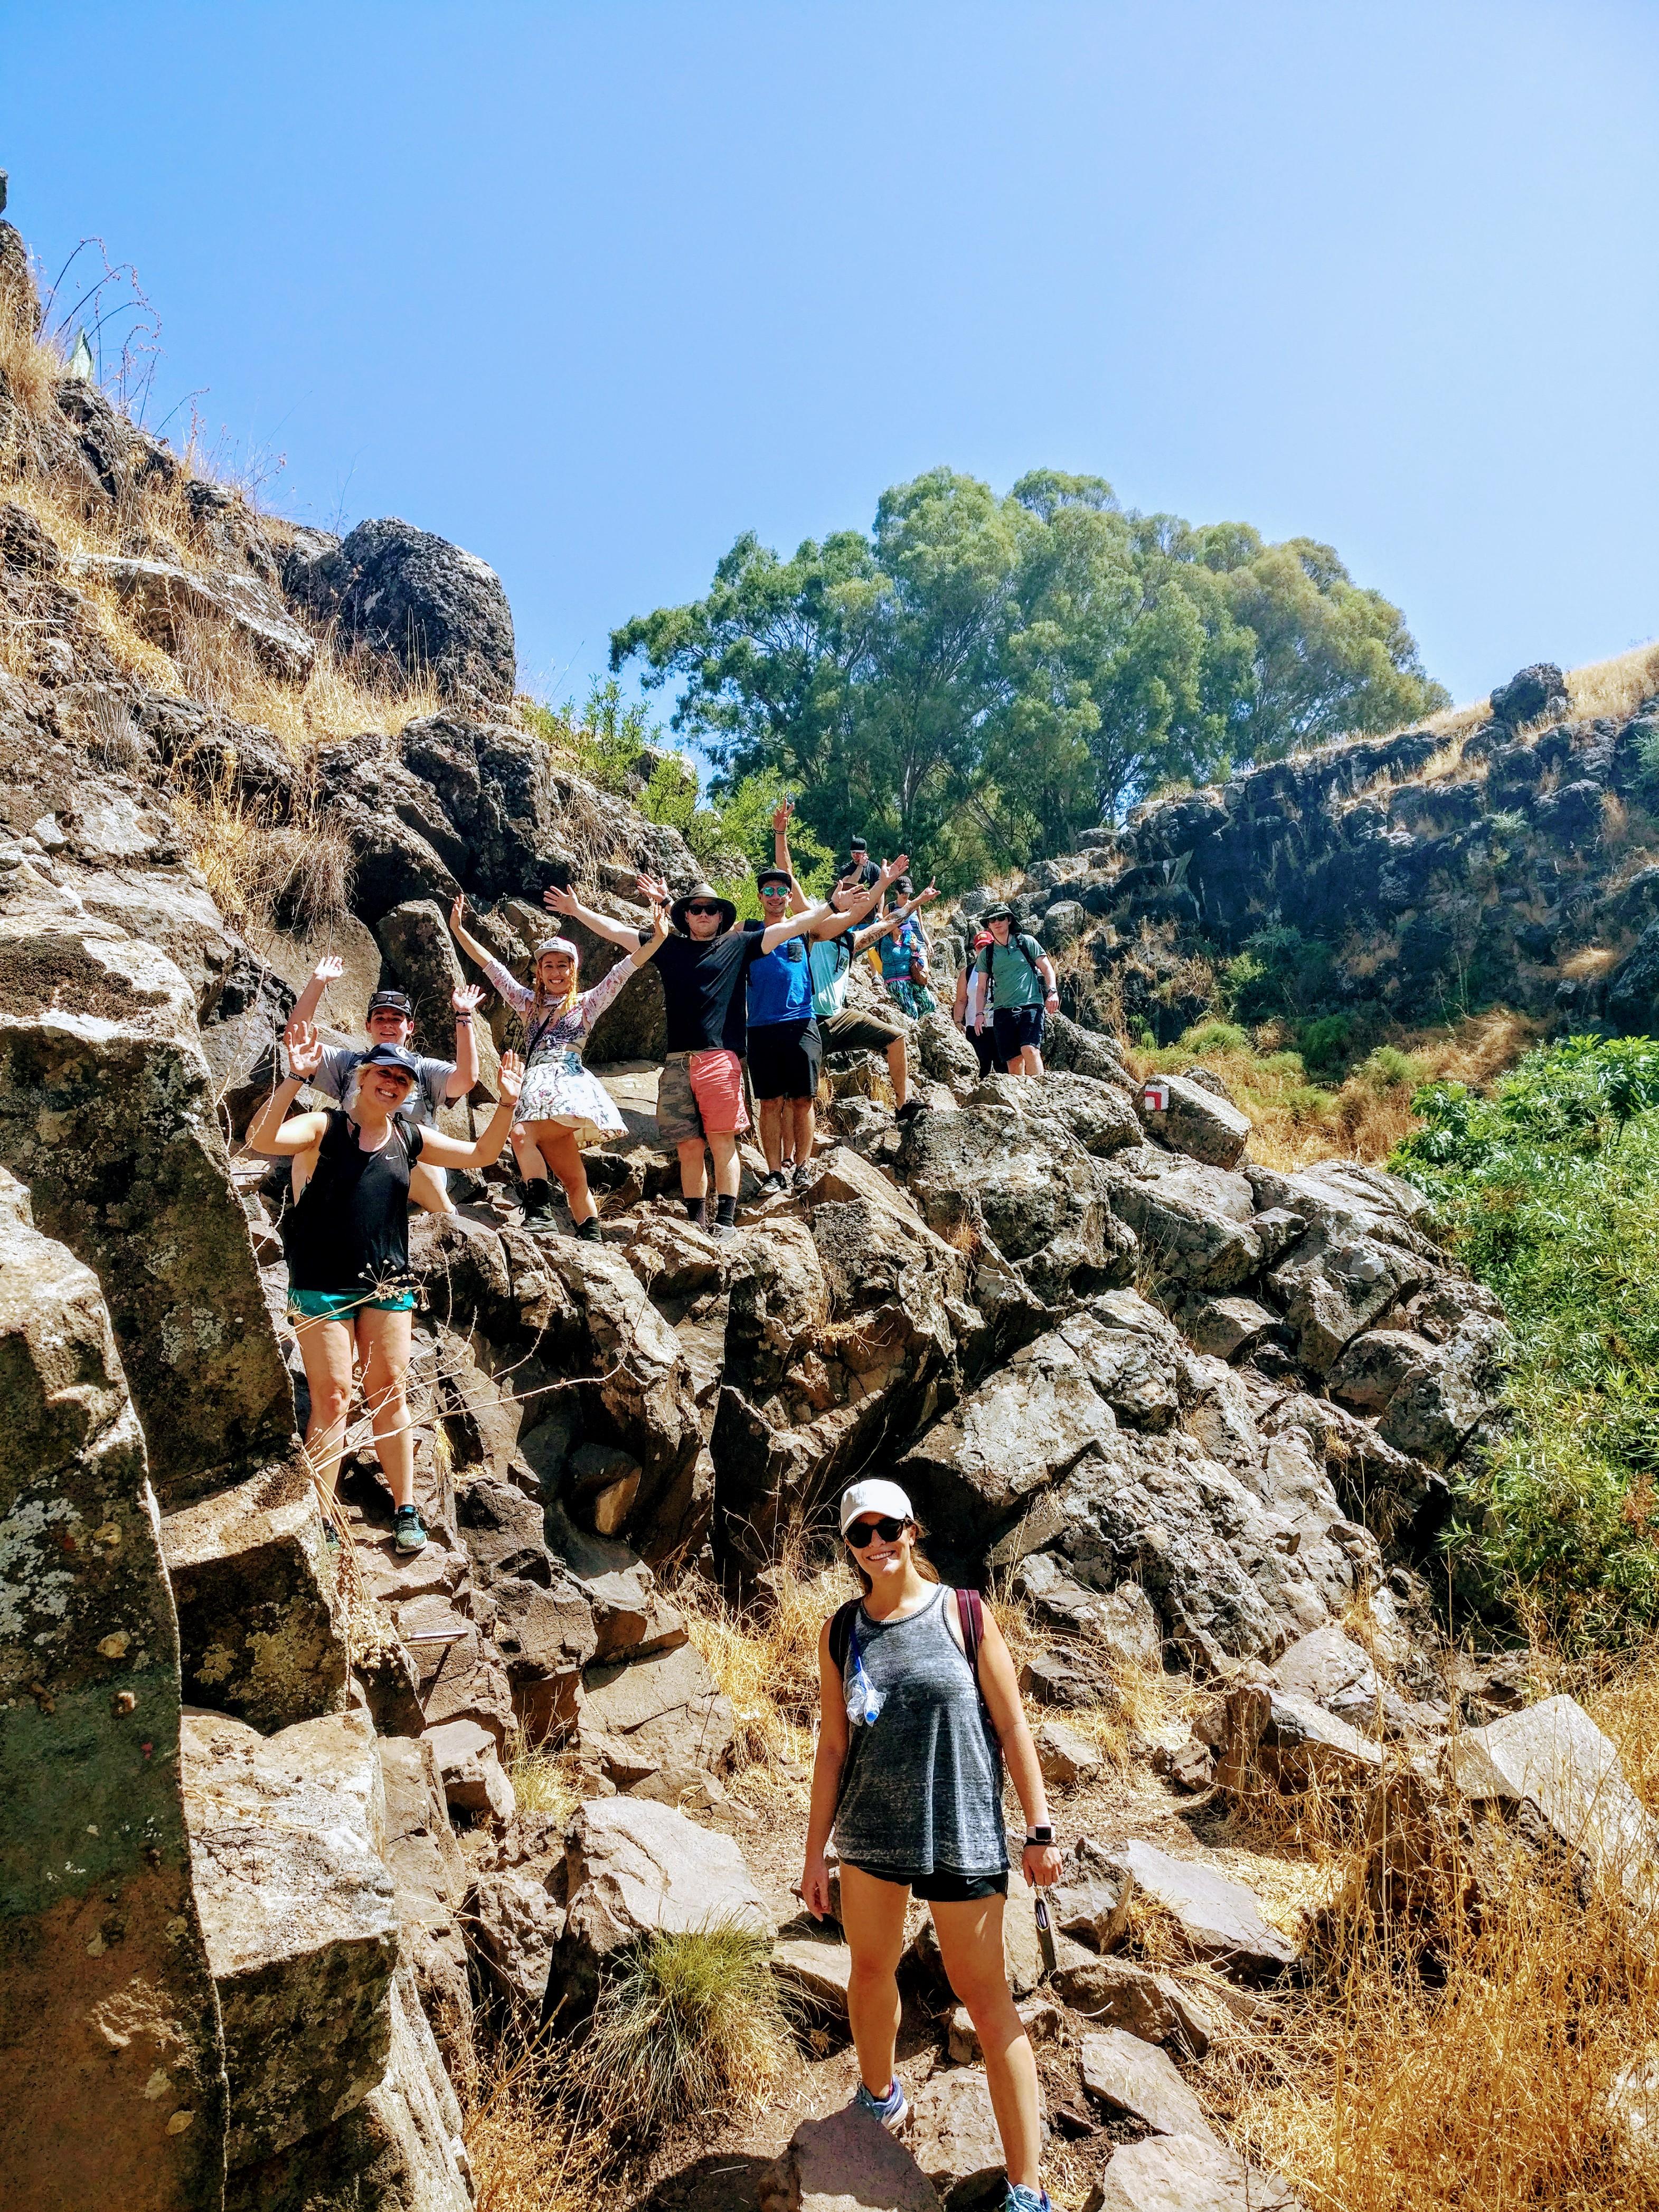 Trekking Israel צוברים חוויות עם